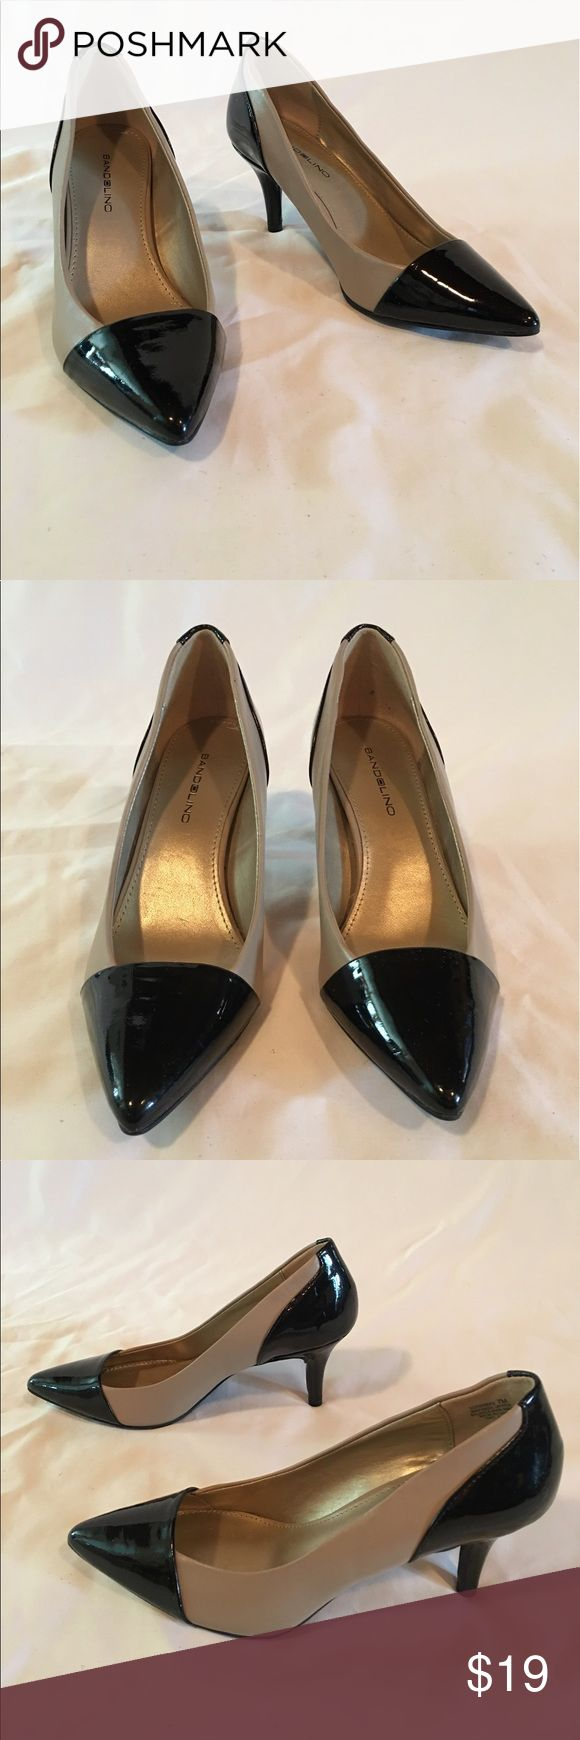 Bandolino Black Toe & Heels Beige Pumps Size 7 Bandolino Black Toe & Heels Beige Pump Heels Size 7 Bandolino Shoes Heels